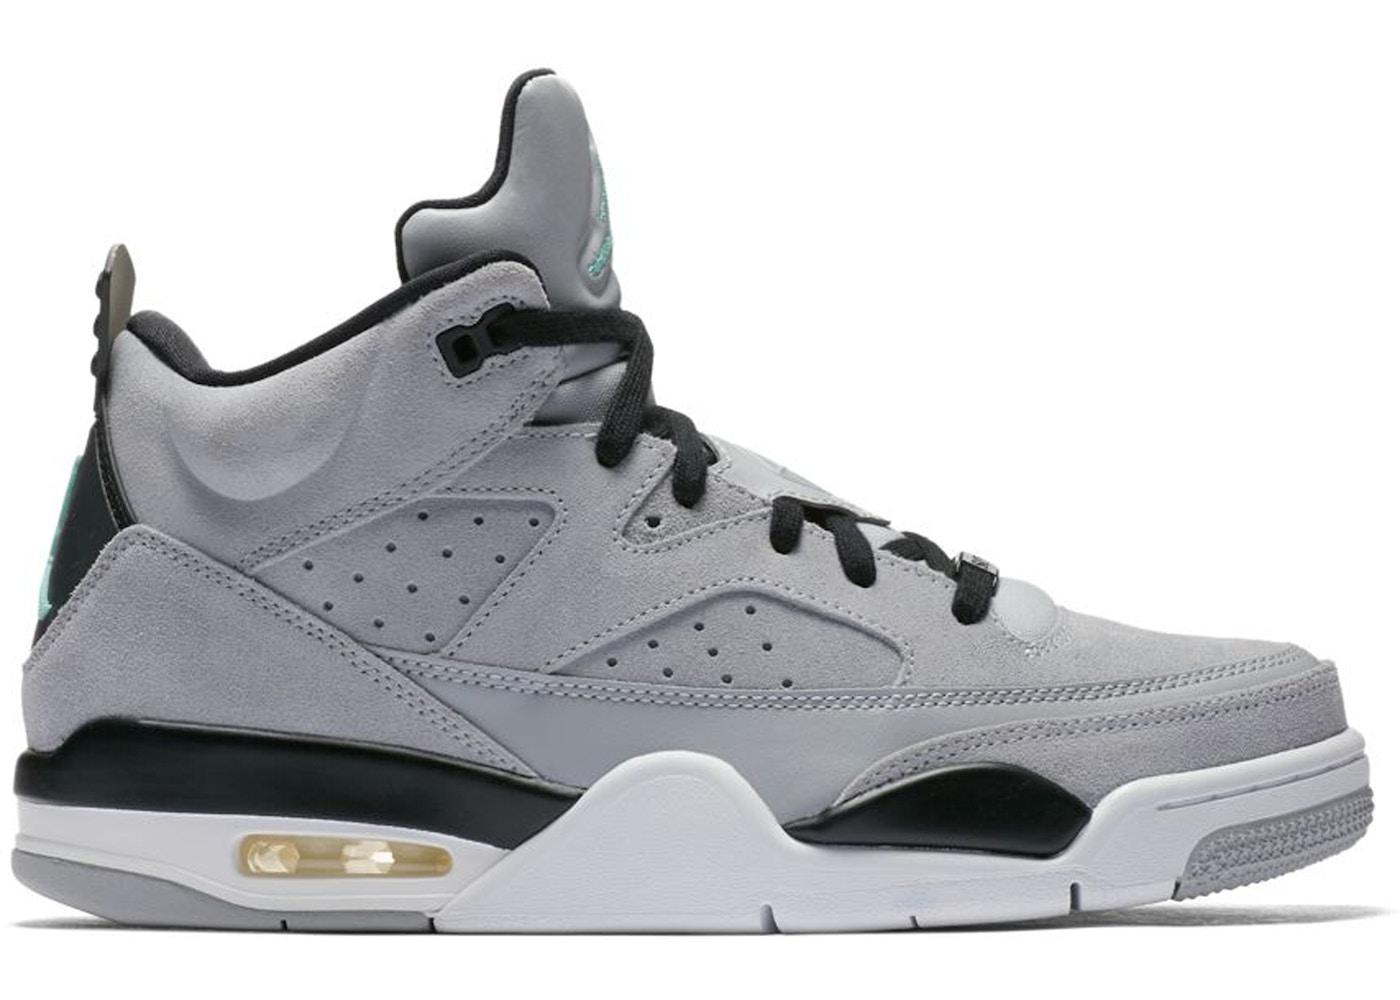 buy online 9b365 d6408 Jordan Son Of Mars Low Wolf Grey